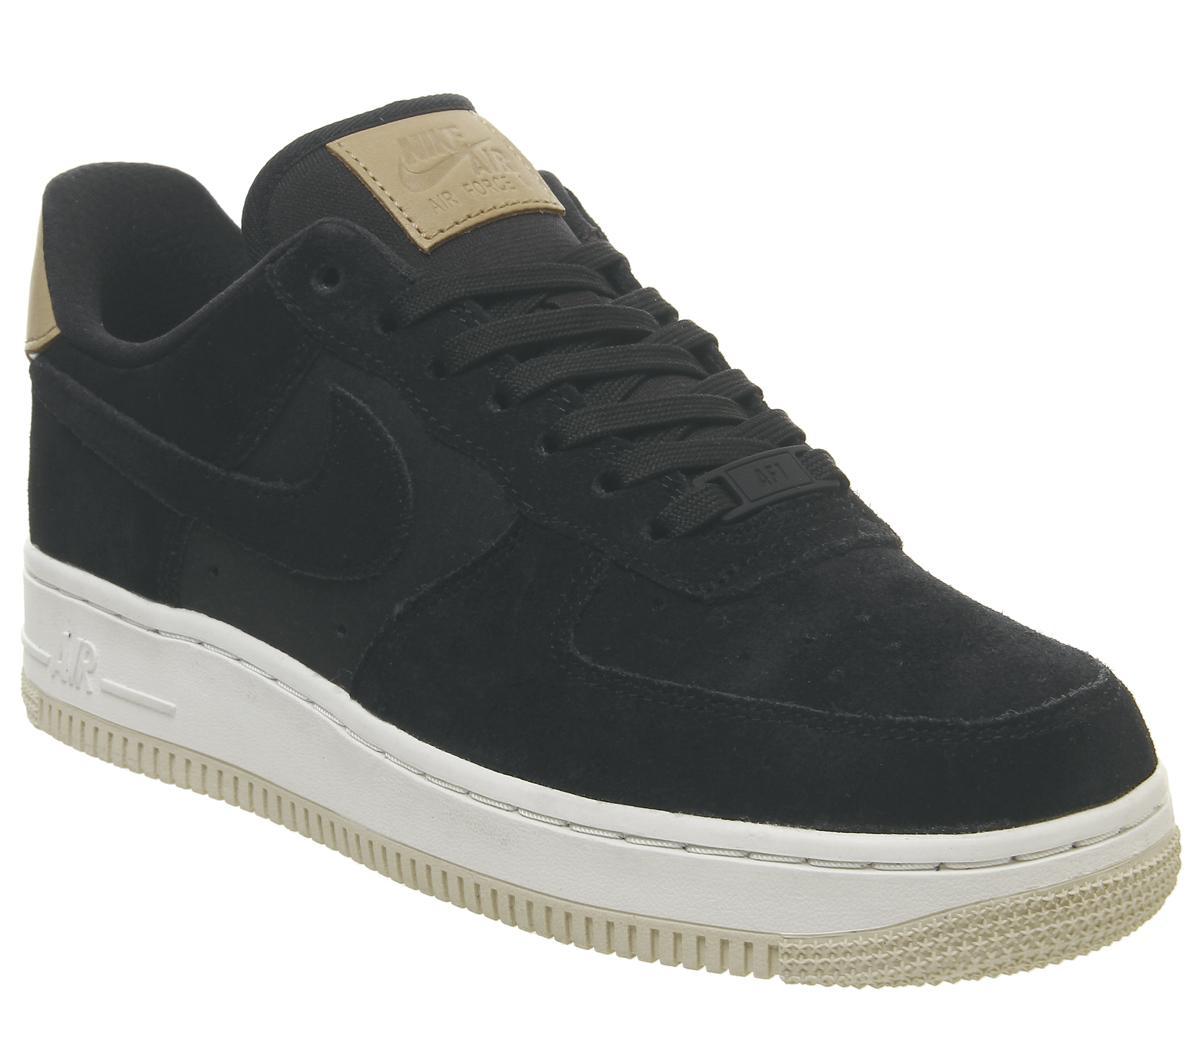 Nike Air Force 1 07 Trainers Hasta Summit White Vachetta Tan